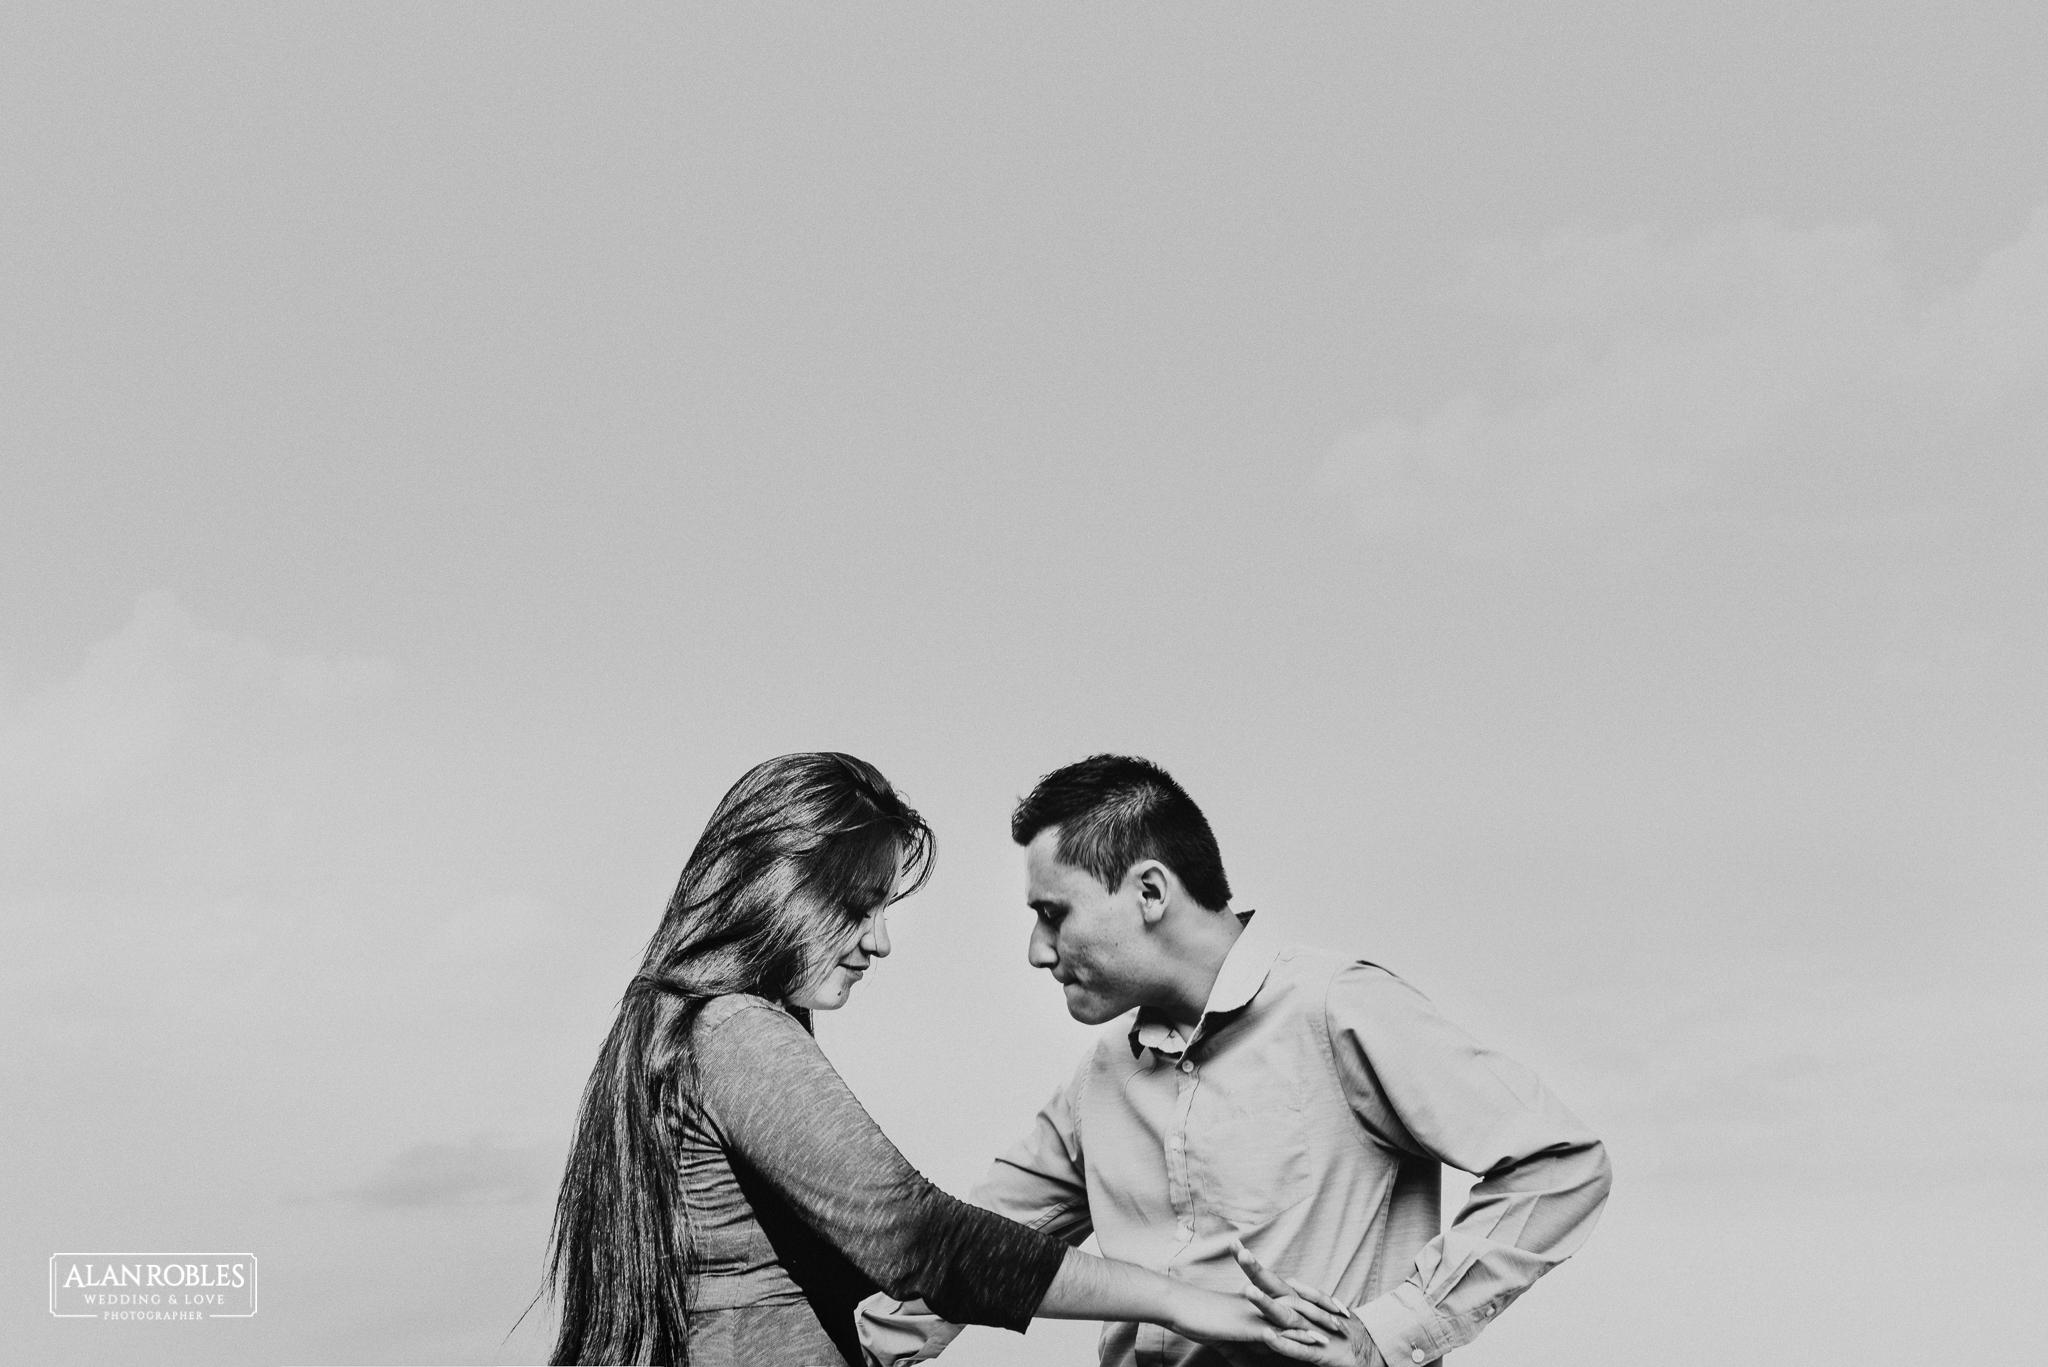 Sesion de fotos Preboda en Laguna de Cajititlan. Fotografia de bodas - Alan Robles Wedding & Love Photographer, Fotografo de bodas en Guadalajara. Fotografia Blanco y negro.